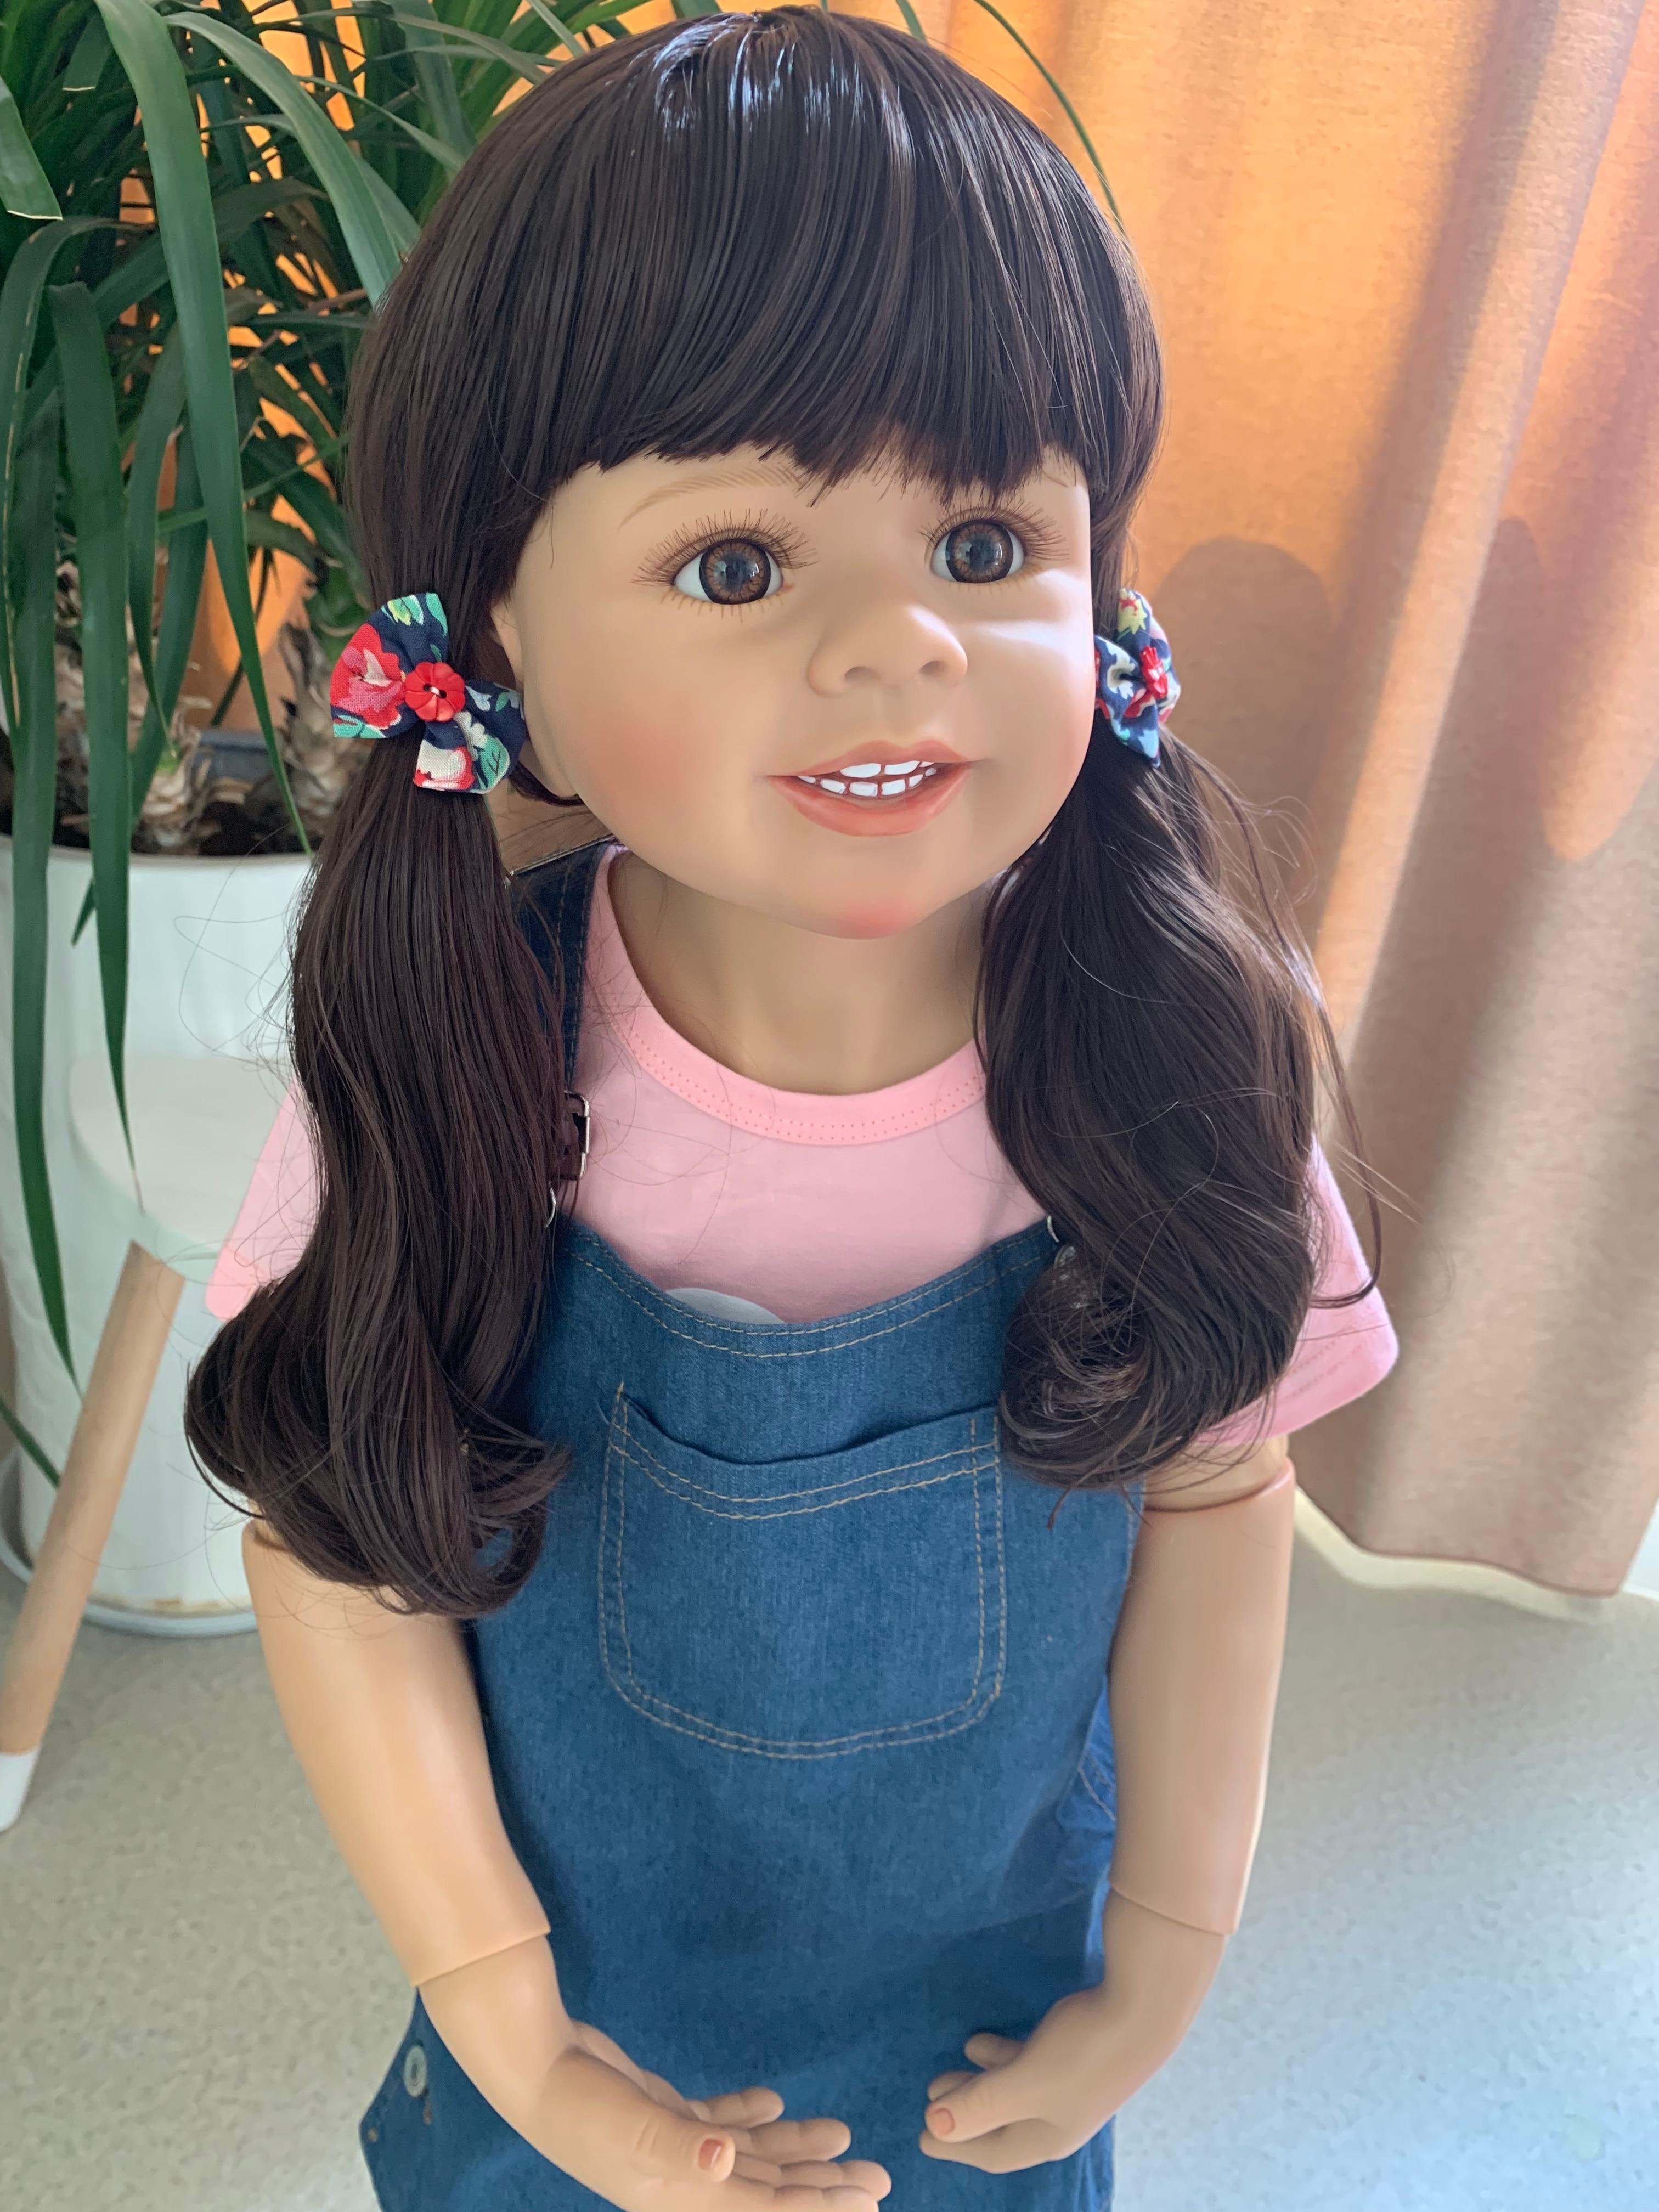 Huge doll 98CM Original Masterpiece big toddler girl doll high quality hard vinyl foll body ball